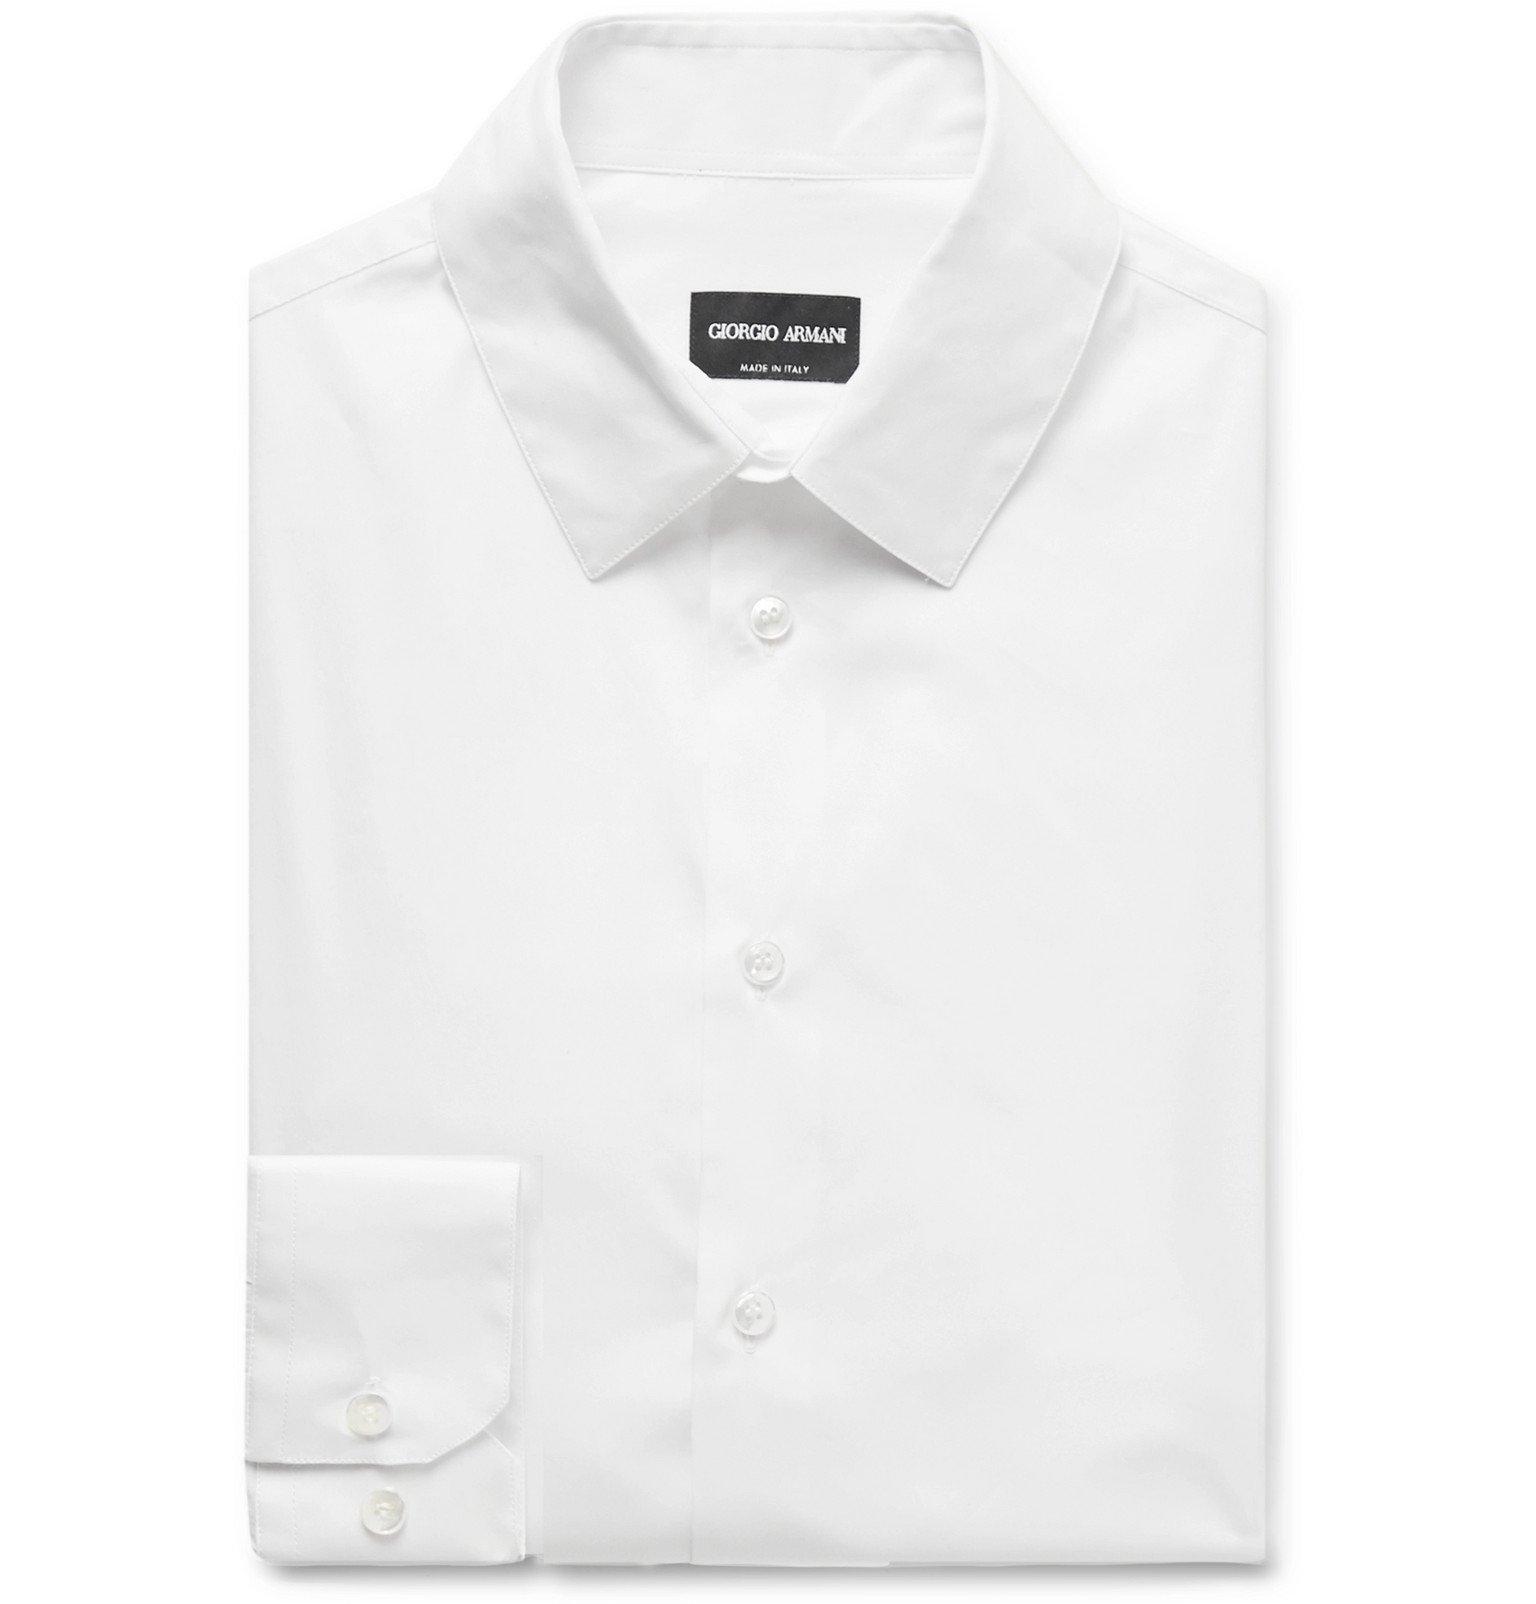 Giorgio Armani - Navy Slim-Fit Stretch Cotton-Blend Shirt - White